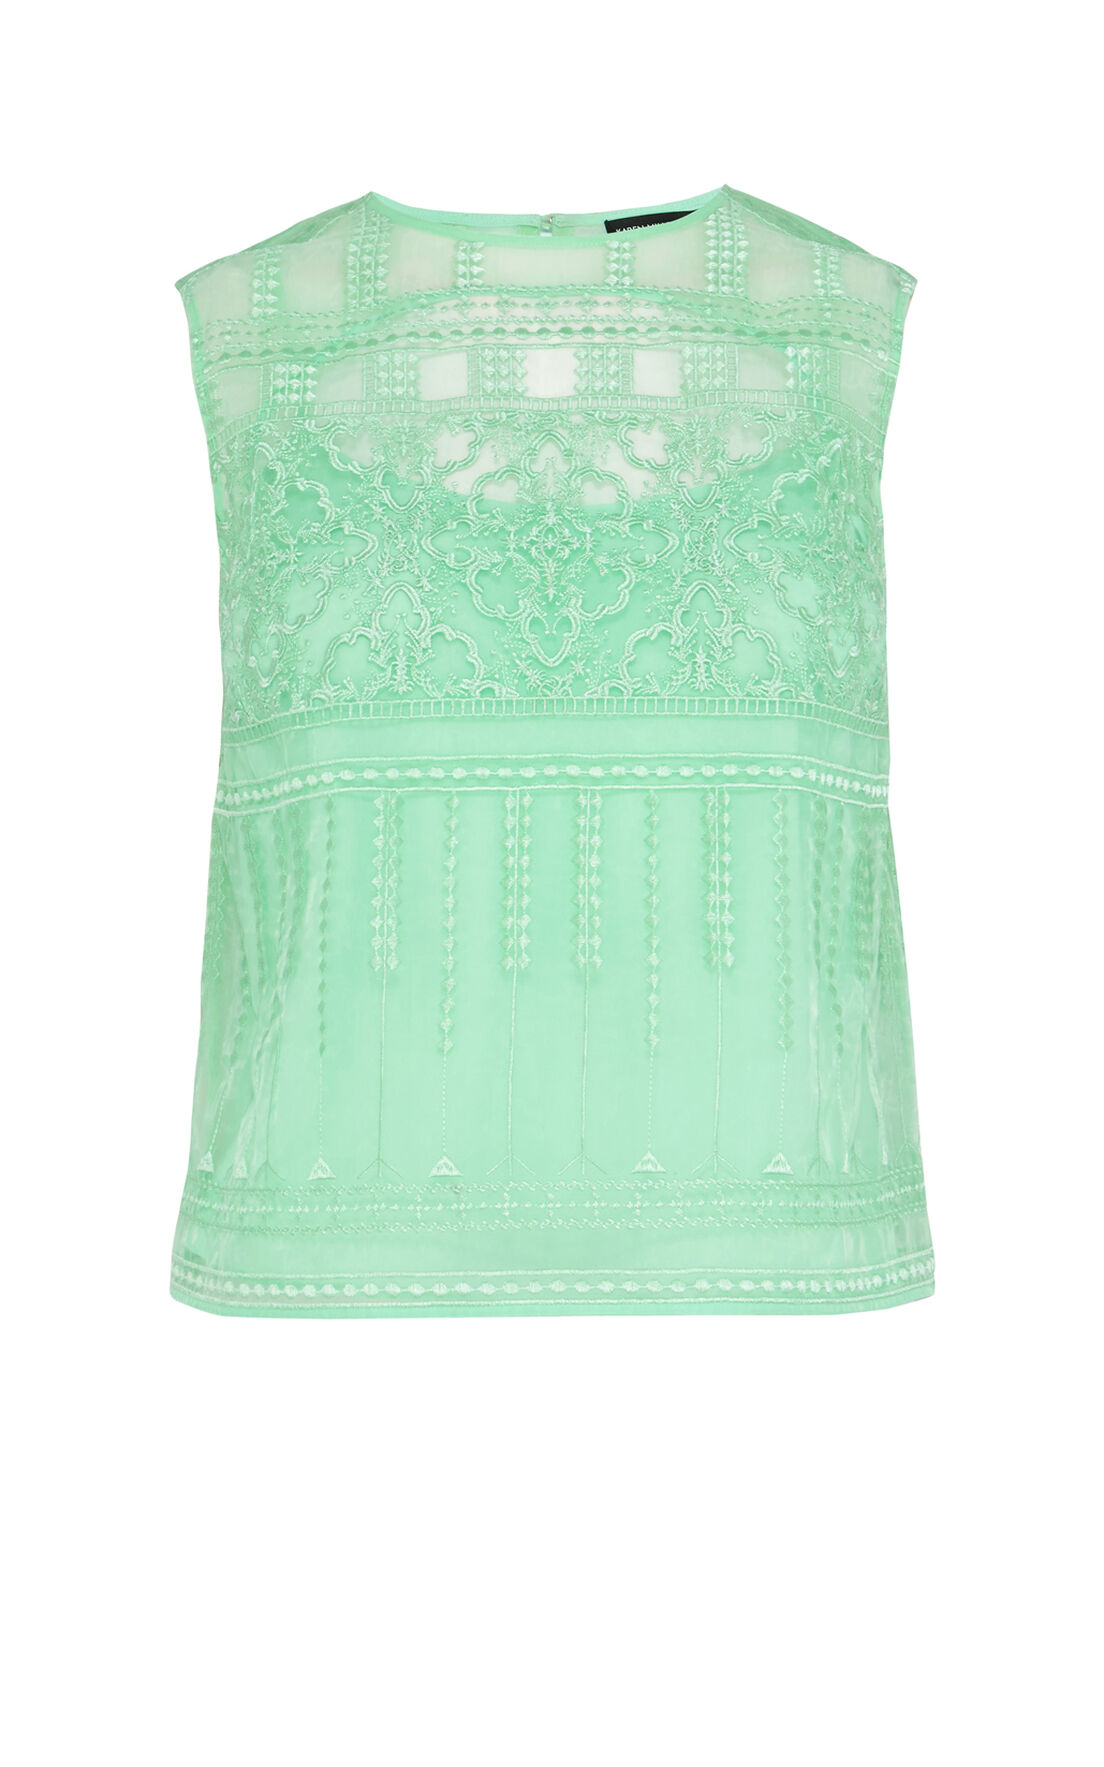 Karen Millen, Lace embroidery organza top Green 0